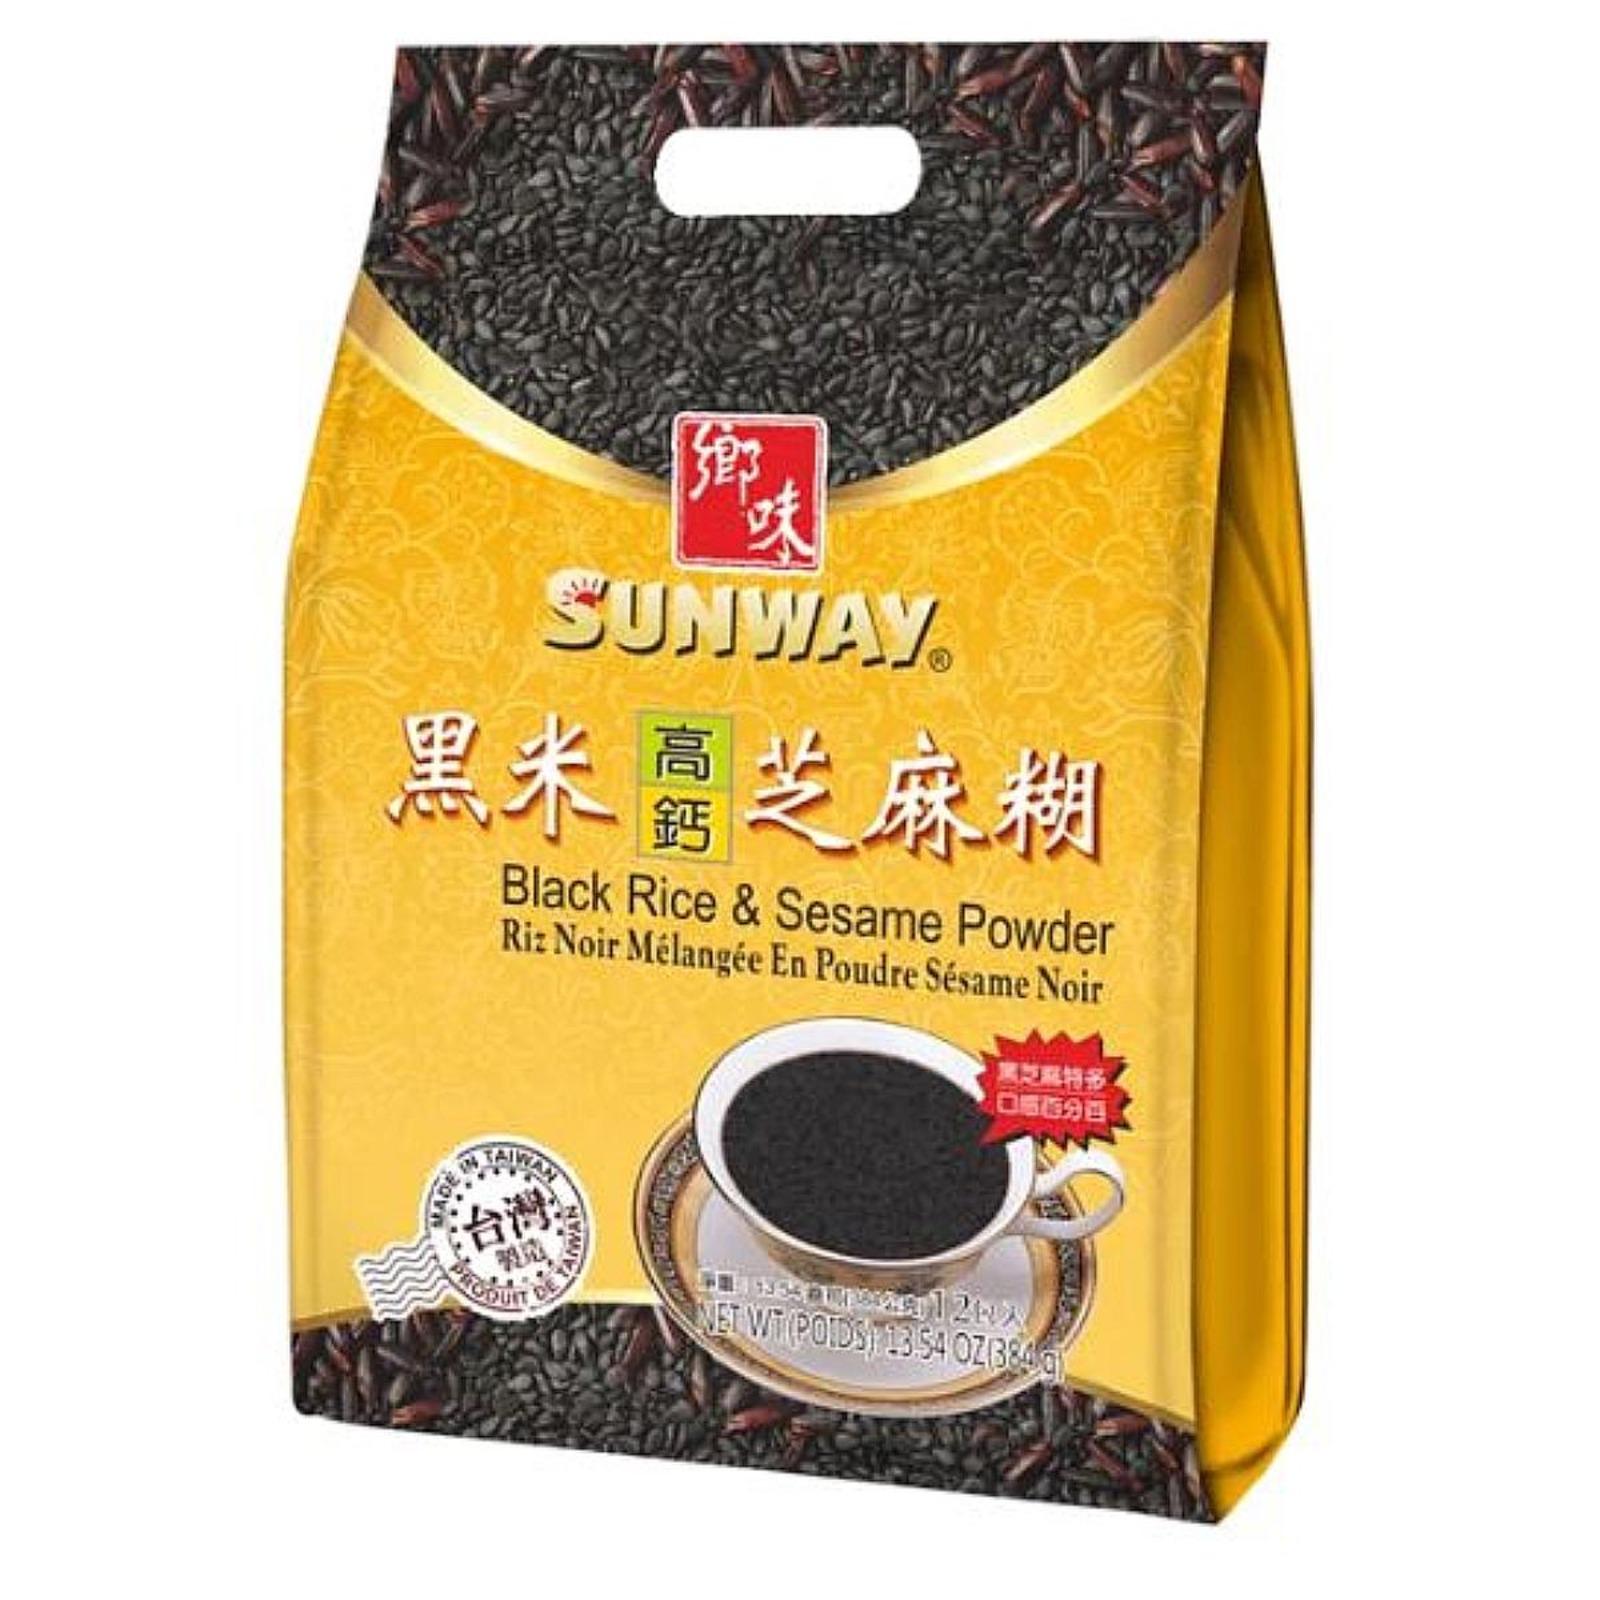 Sunway Black Rice & Sesame